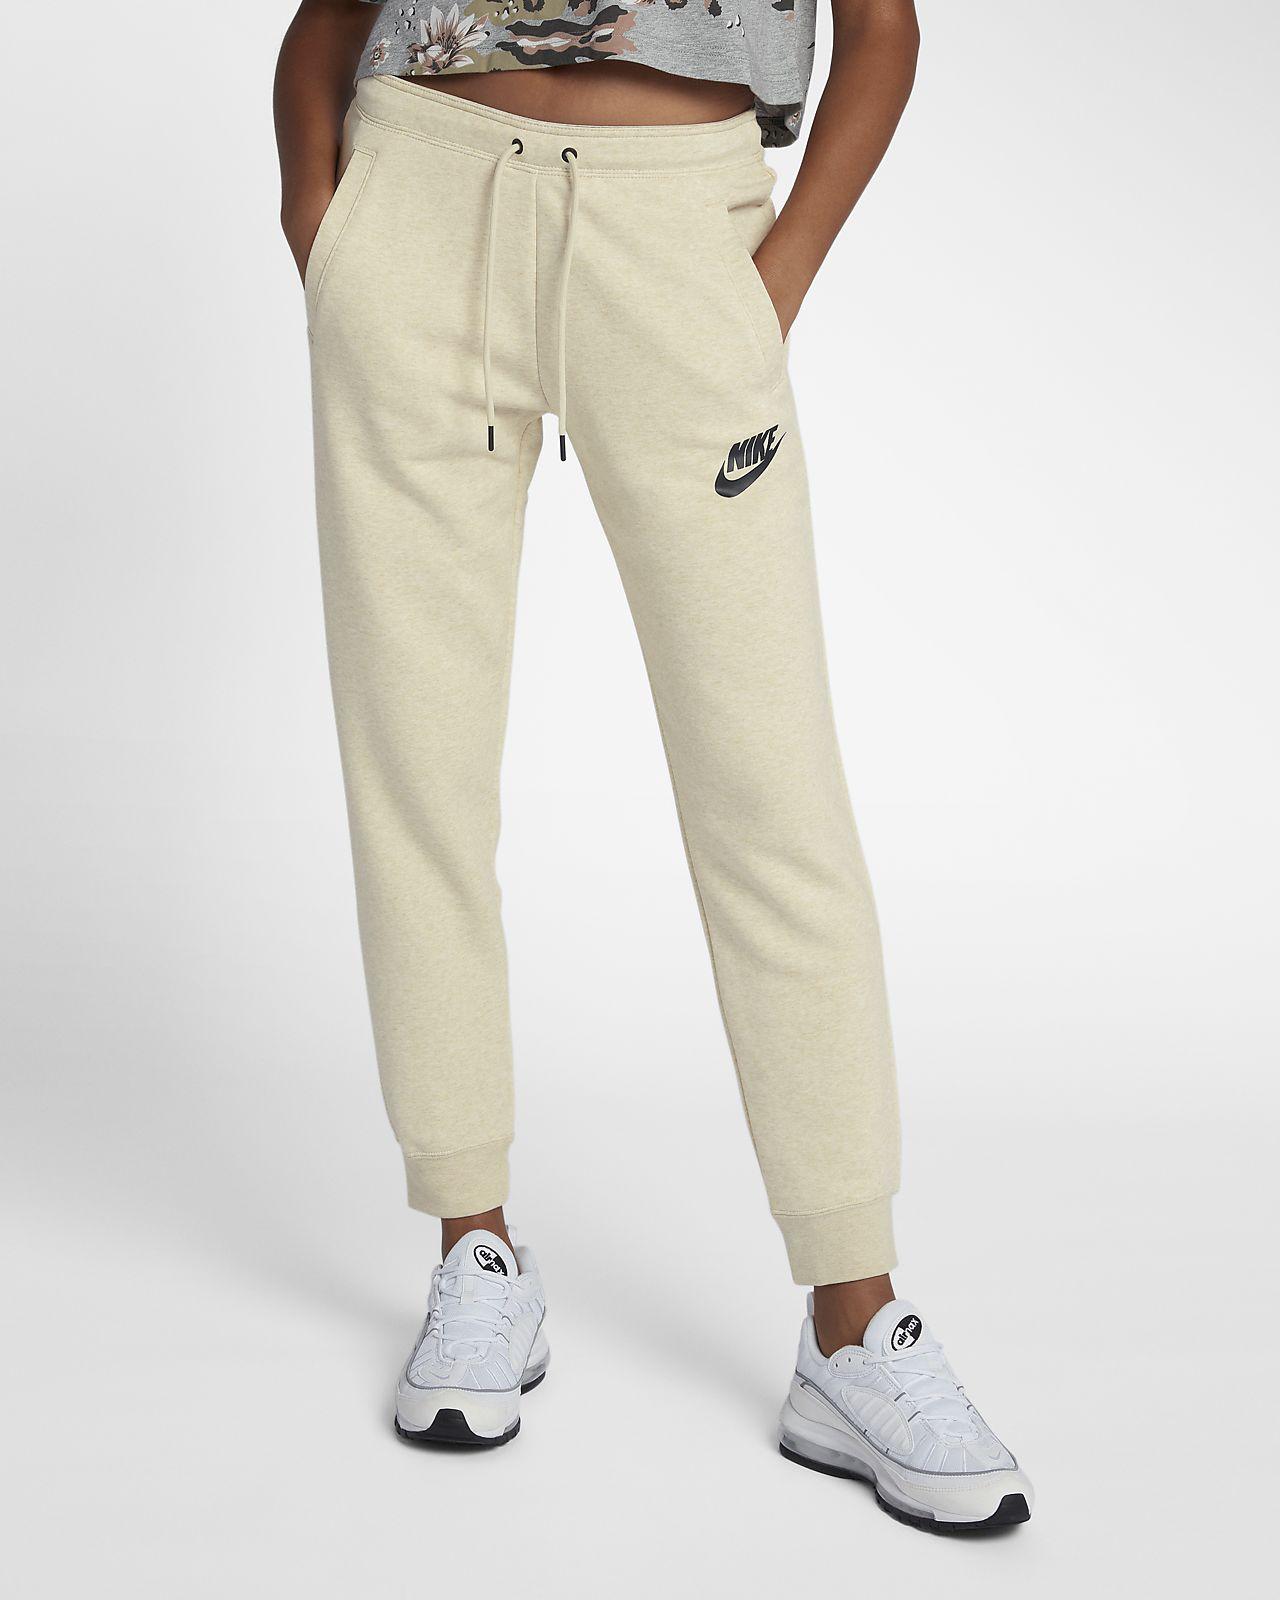 0a7cf39653567 Nike Sportswear Rally Pantalón - Mujer. Nike.com ES